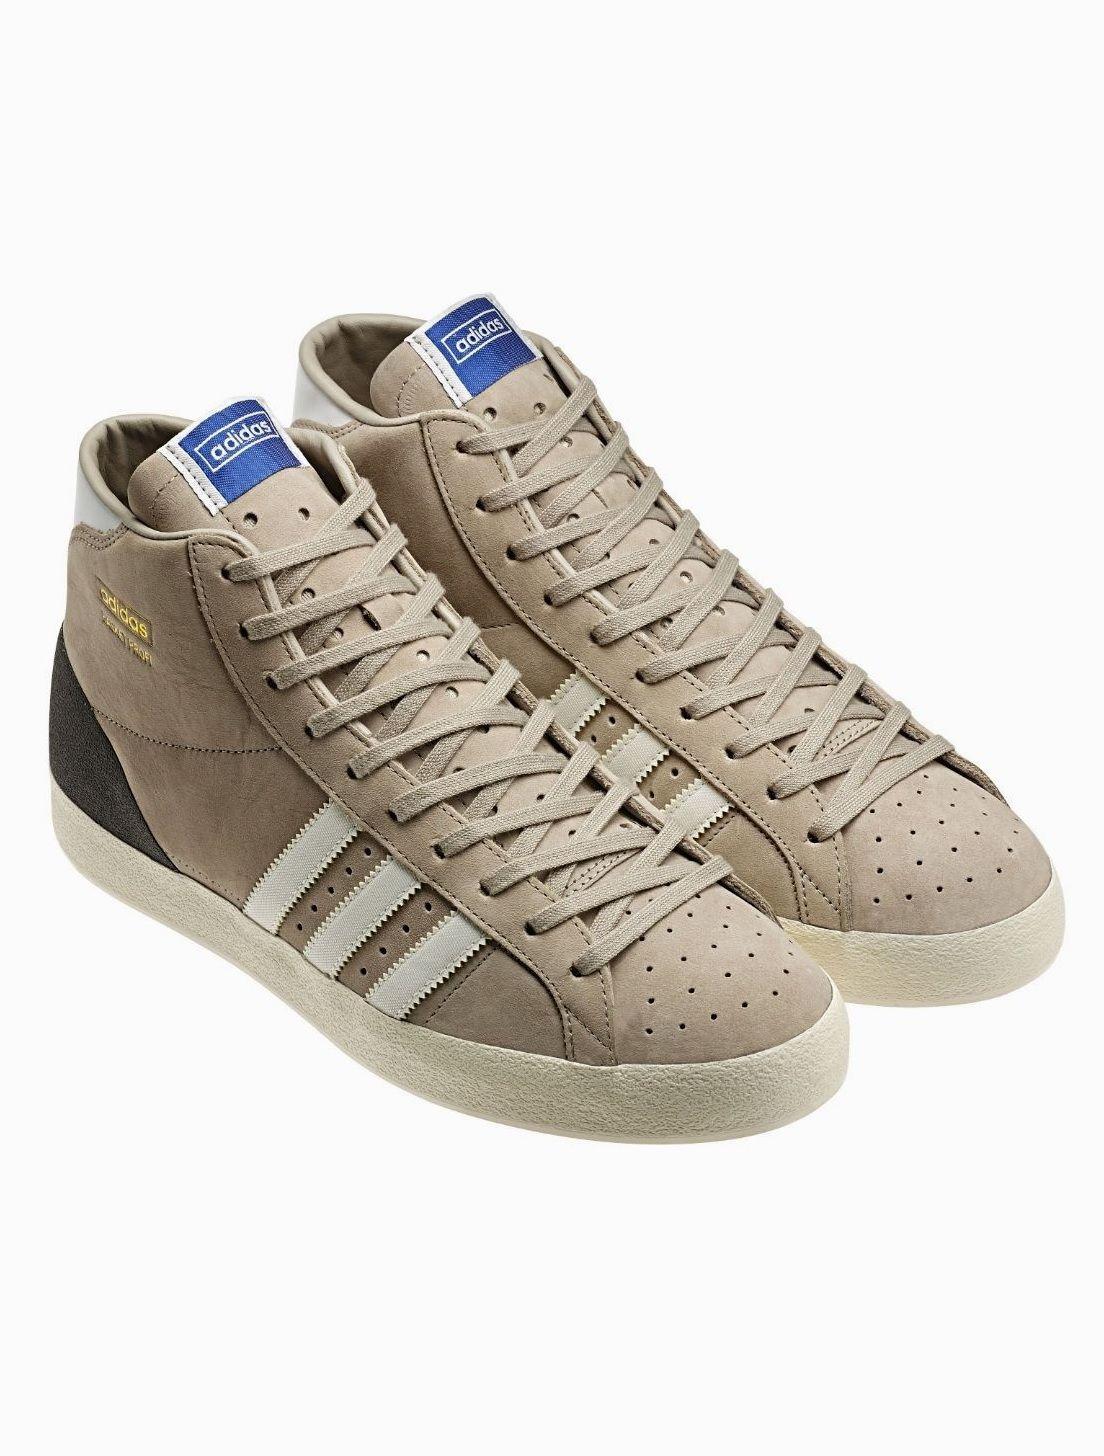 adidas Originals Basket Profi: Light Tan